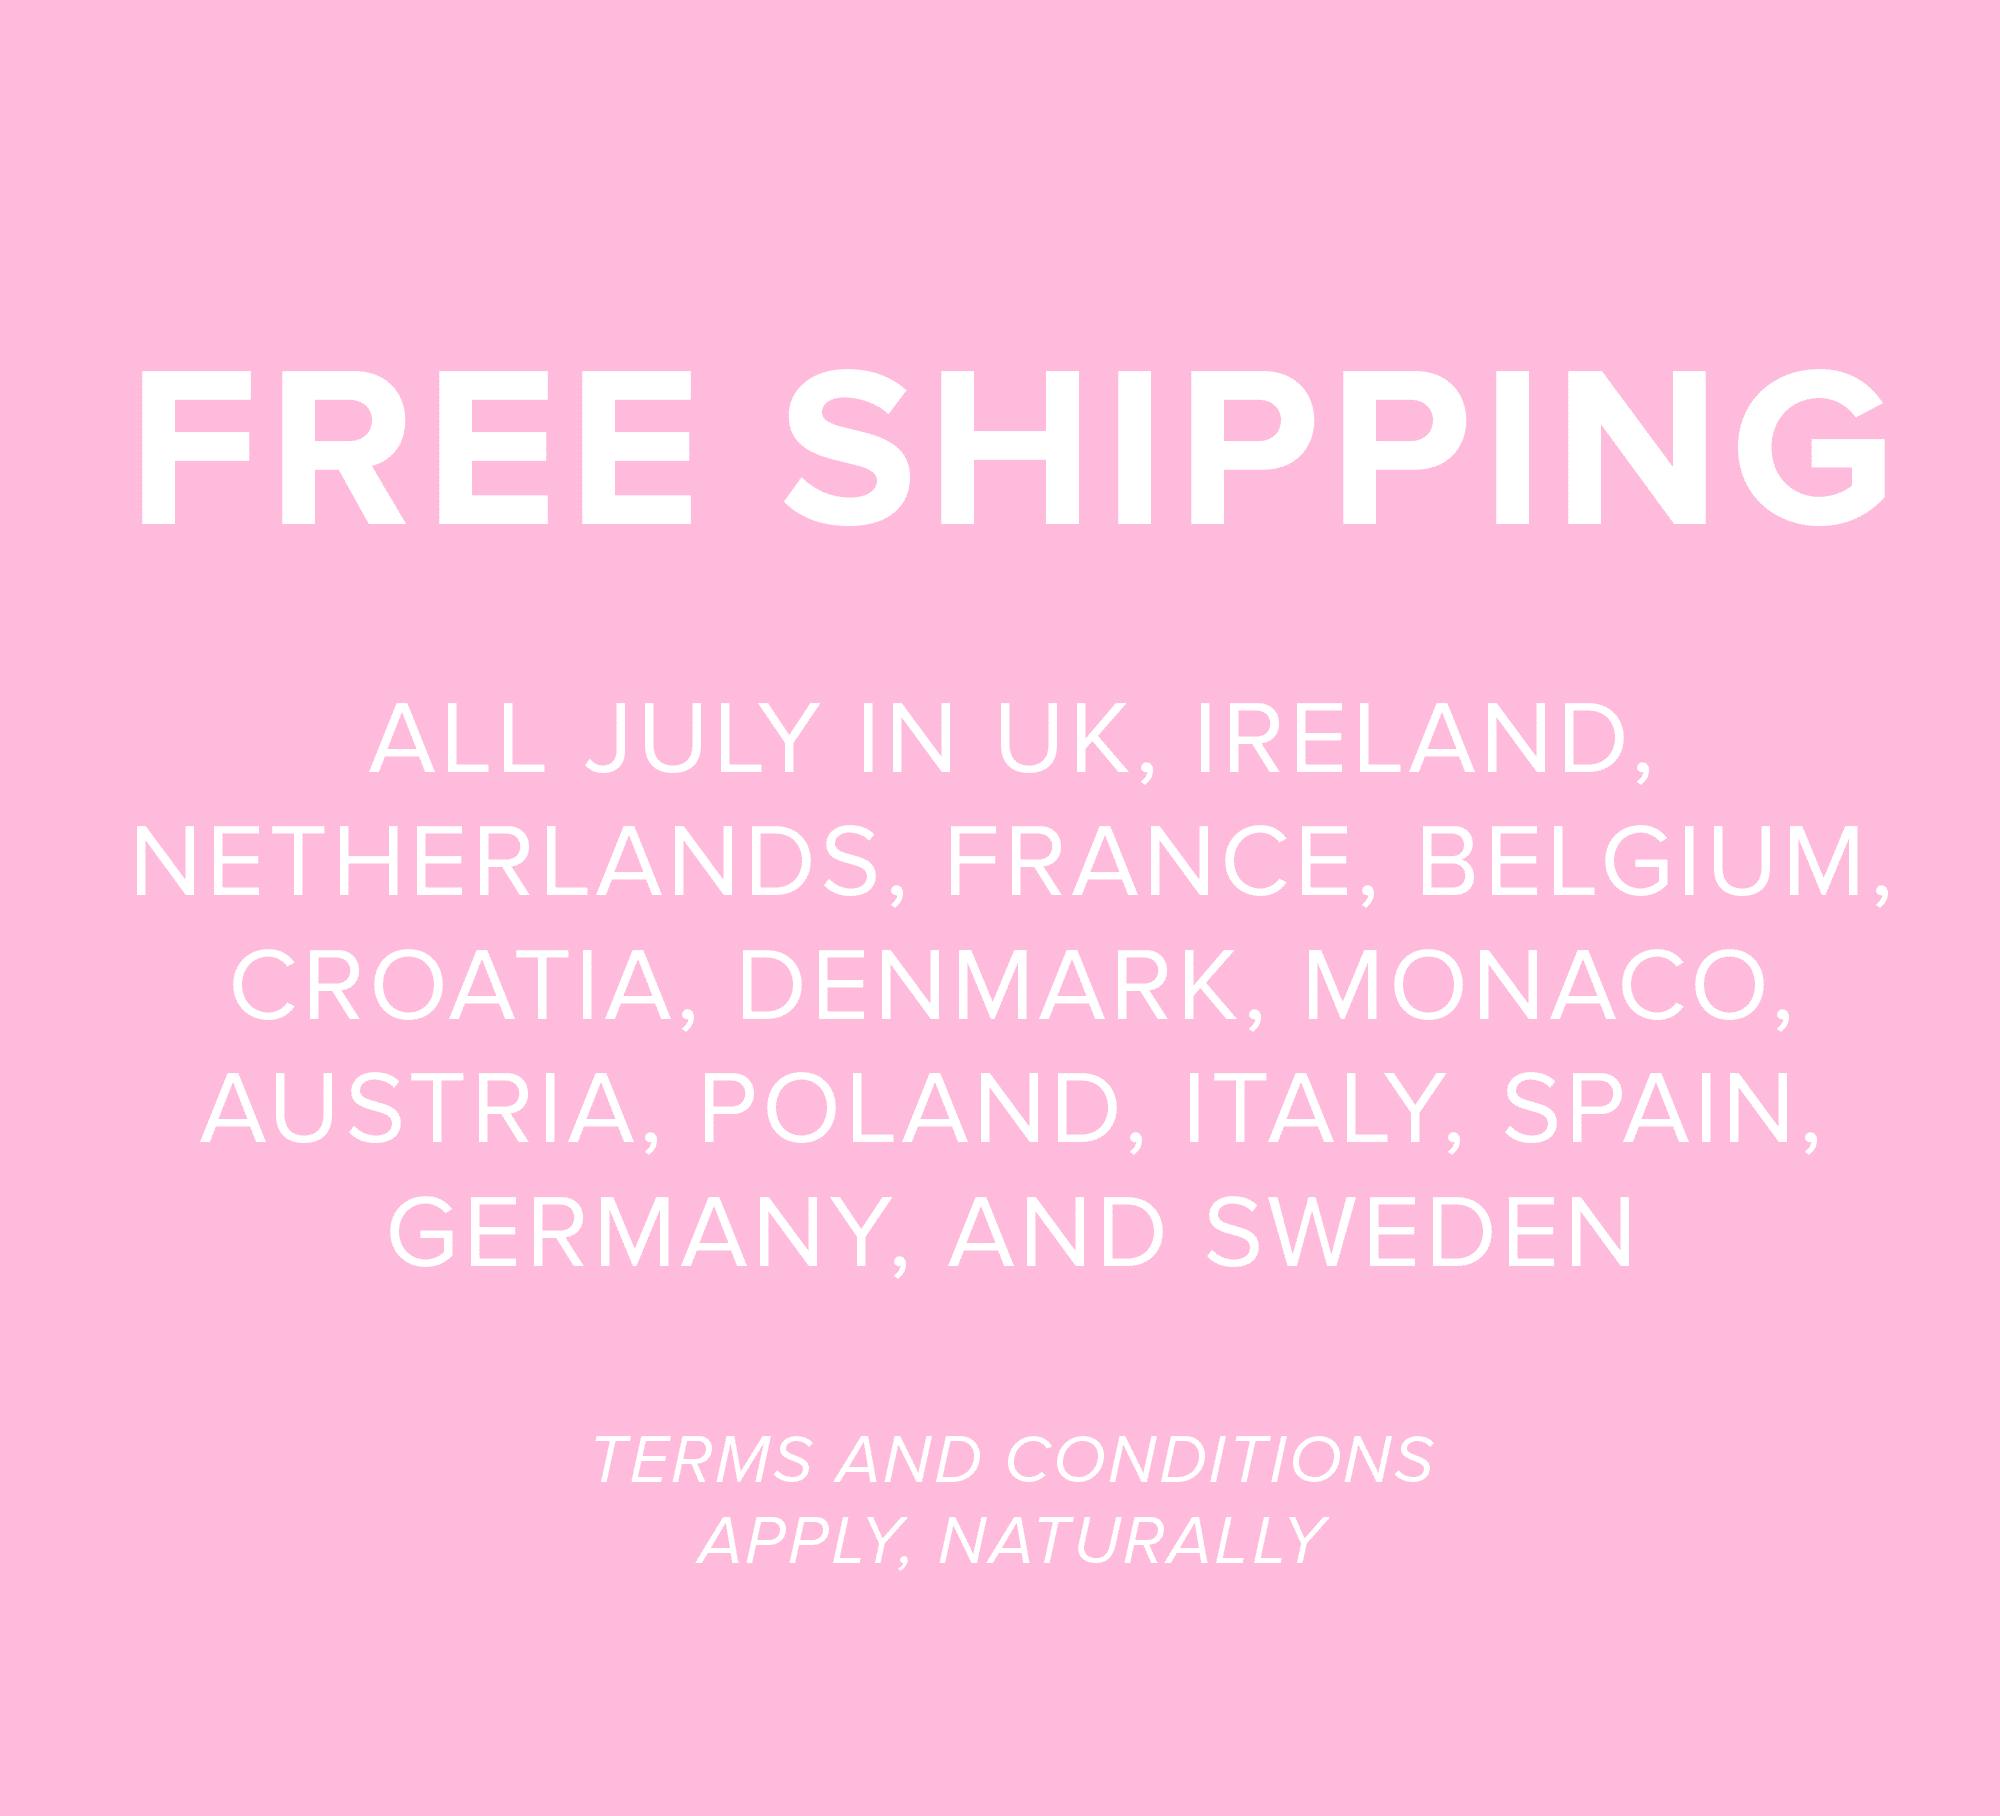 Fridja-Banner-free-shipping